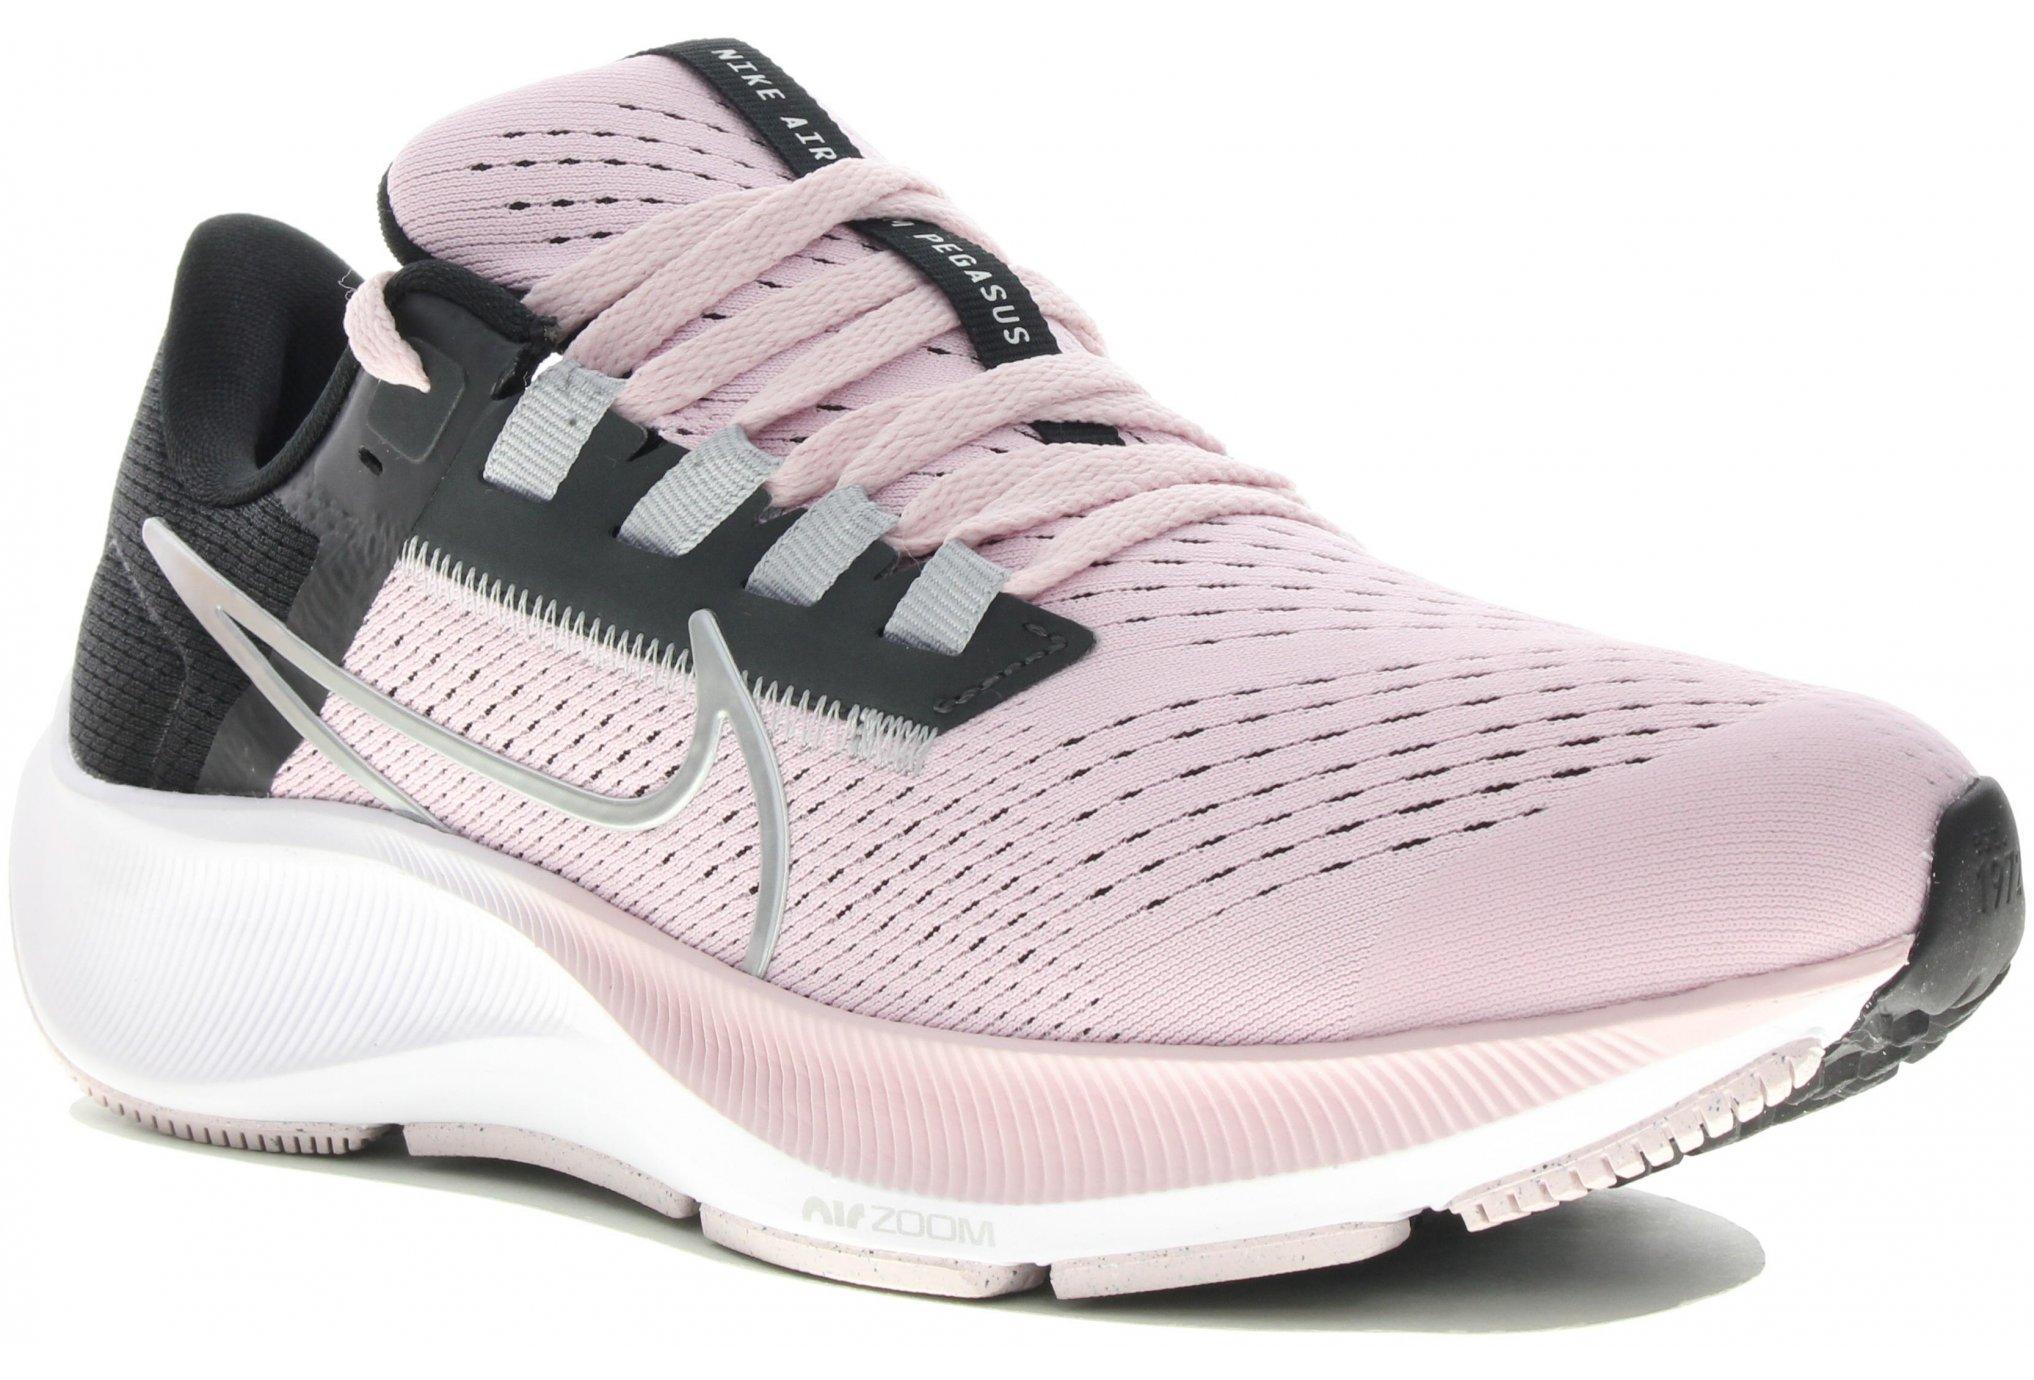 Nike Air Zoom Pegasus 38 Fille Chaussures running femme